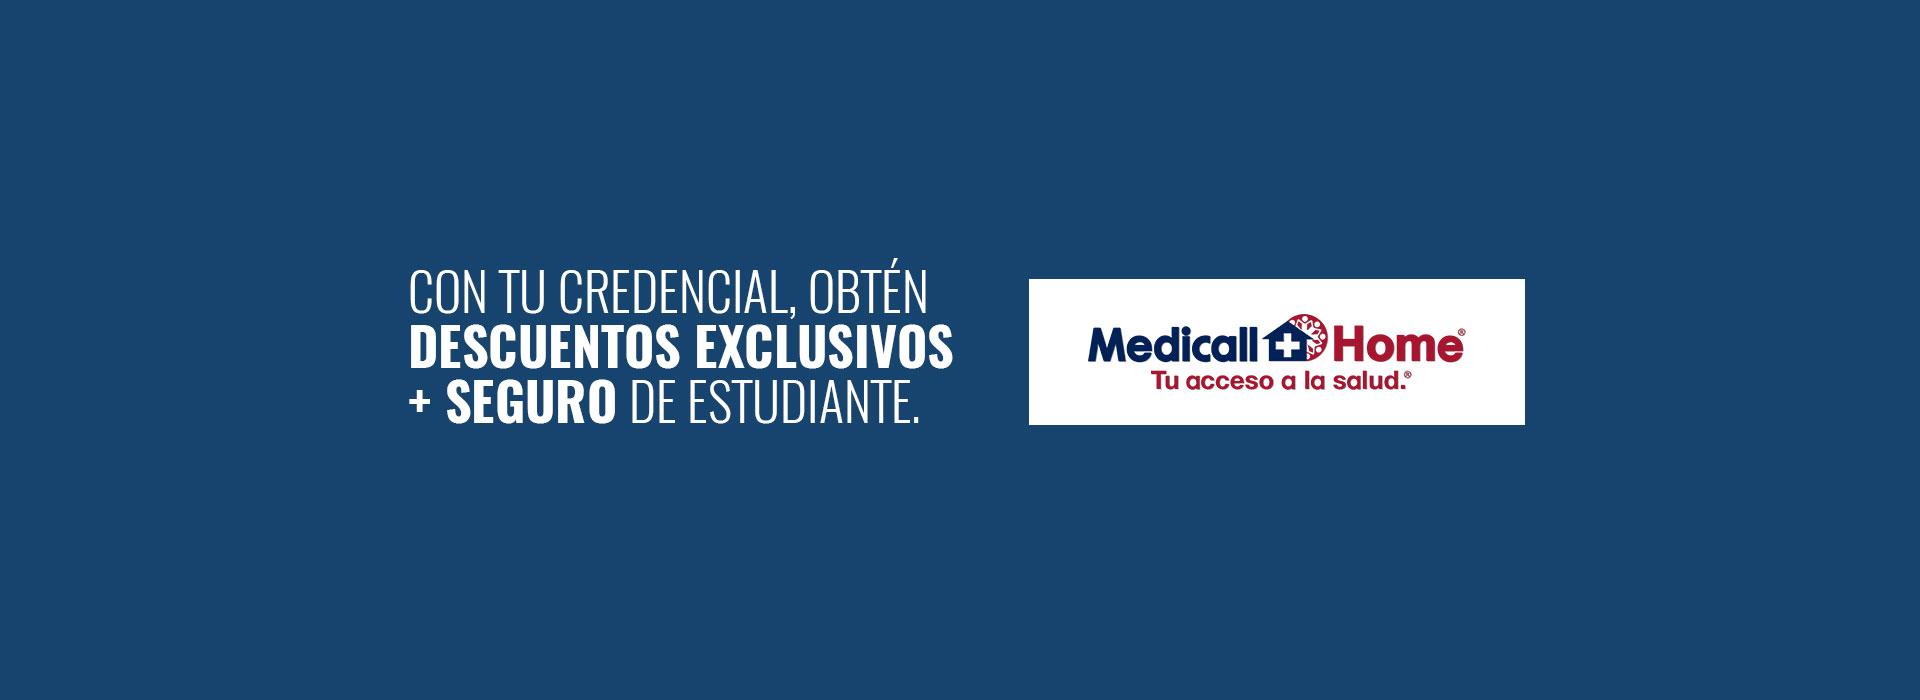 medicall home queretaro